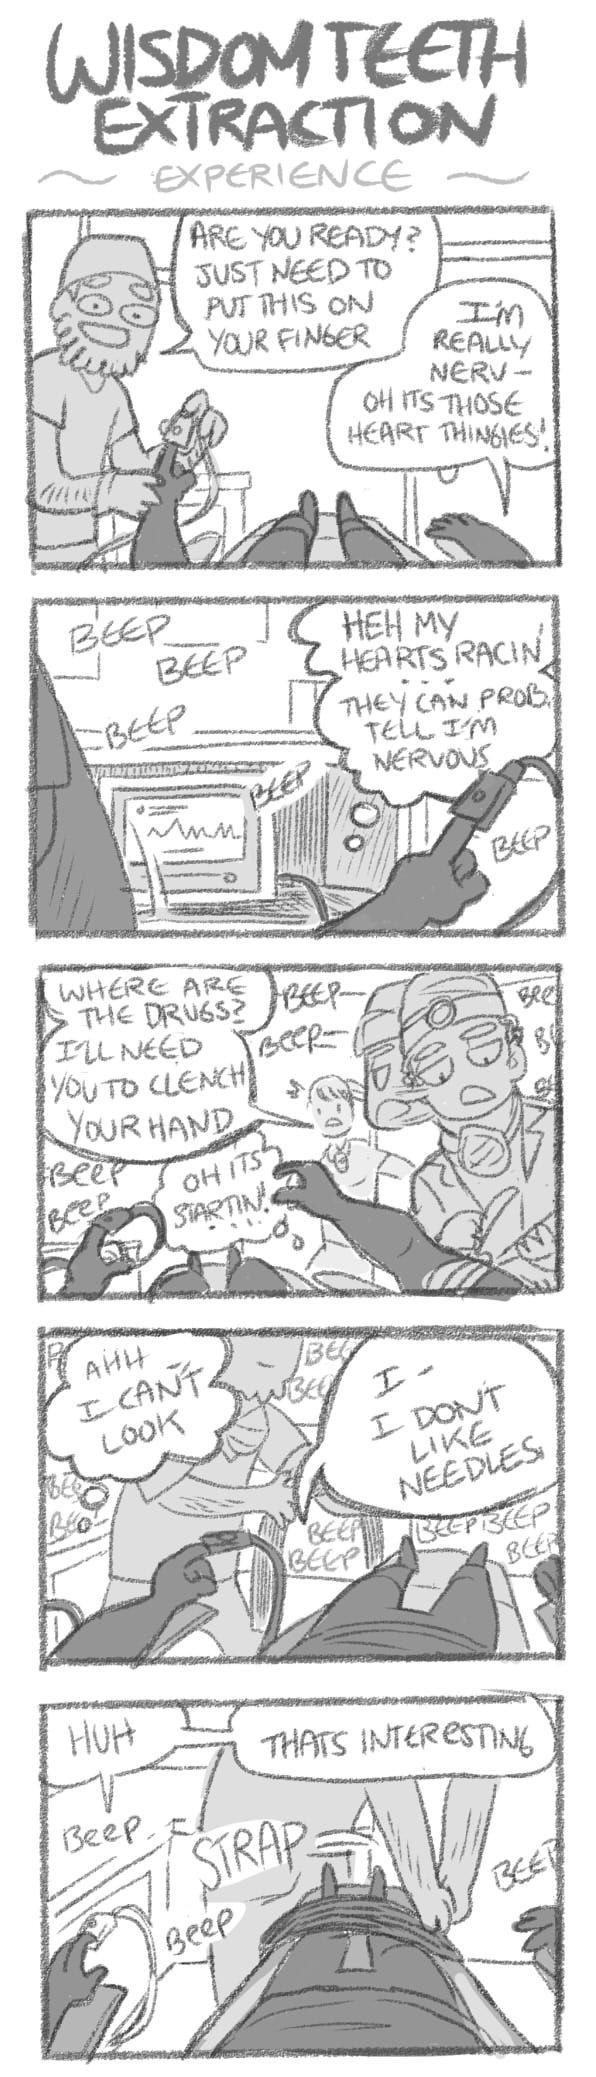 Mondo Mango :: Wisdom Teeth Extraction Experience | Tapastic Comics - image 1